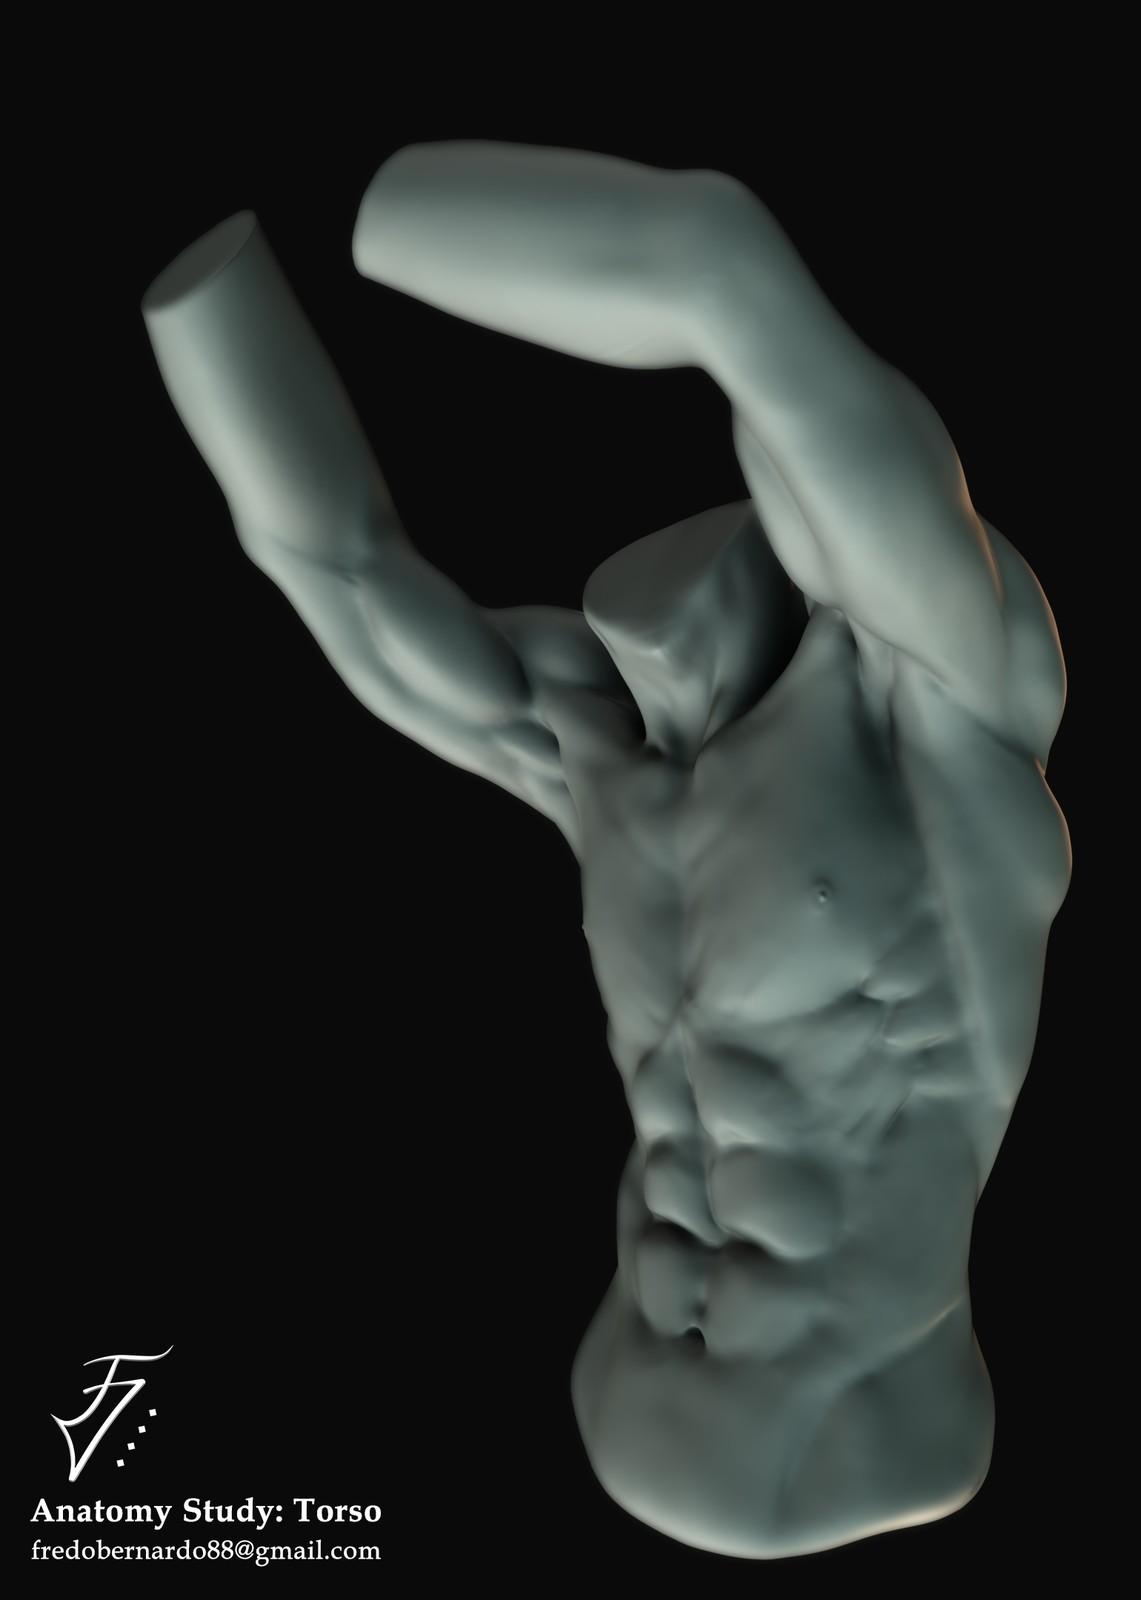 Anatomy Study: Torso